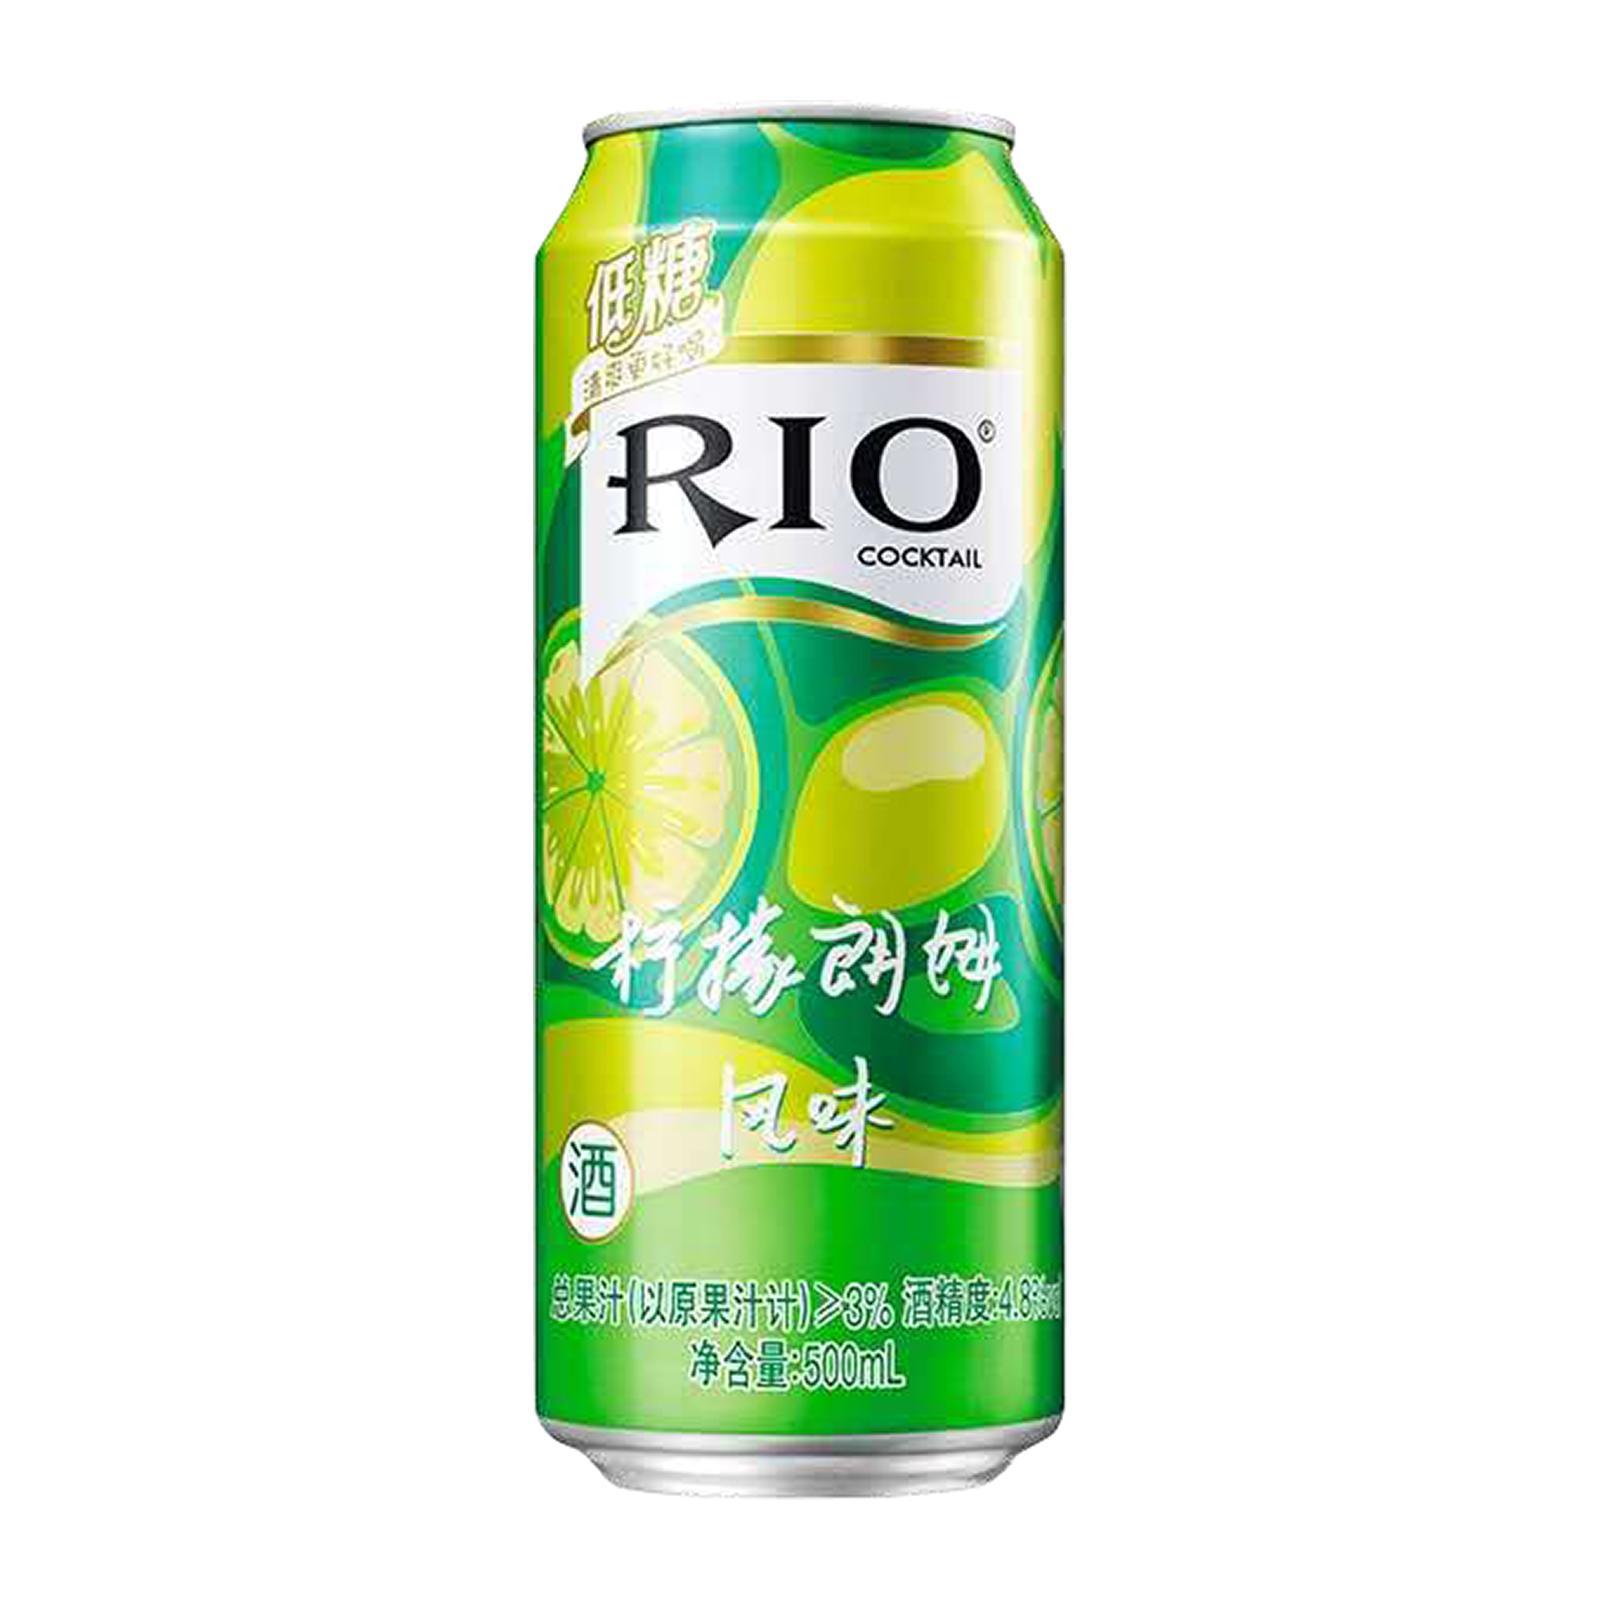 Rio Cocktail Lemon+Rum 3.0% 500Ml